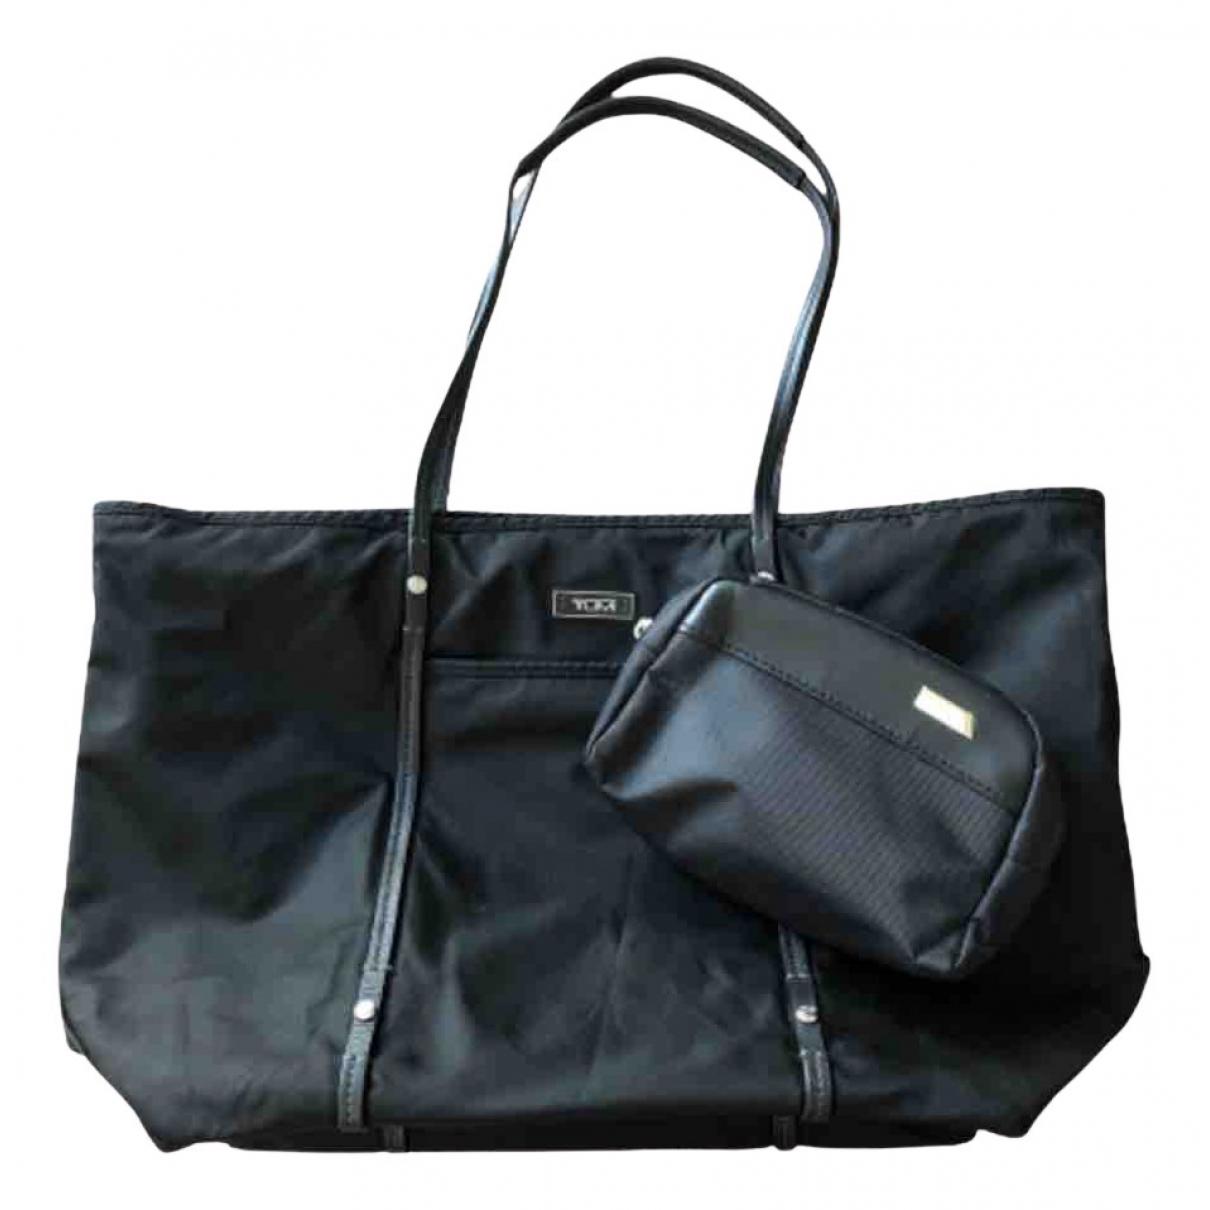 Tumi \N Handtasche in  Schwarz Synthetik